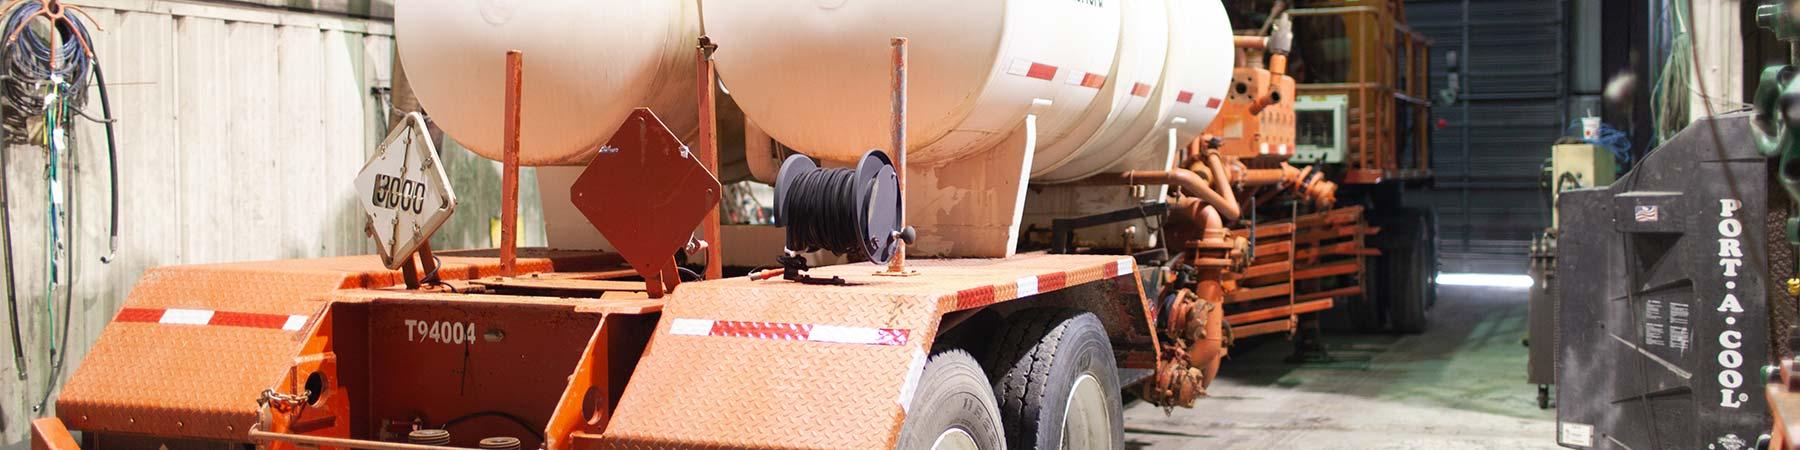 fleet service of tulsa oilfield test pit equipment